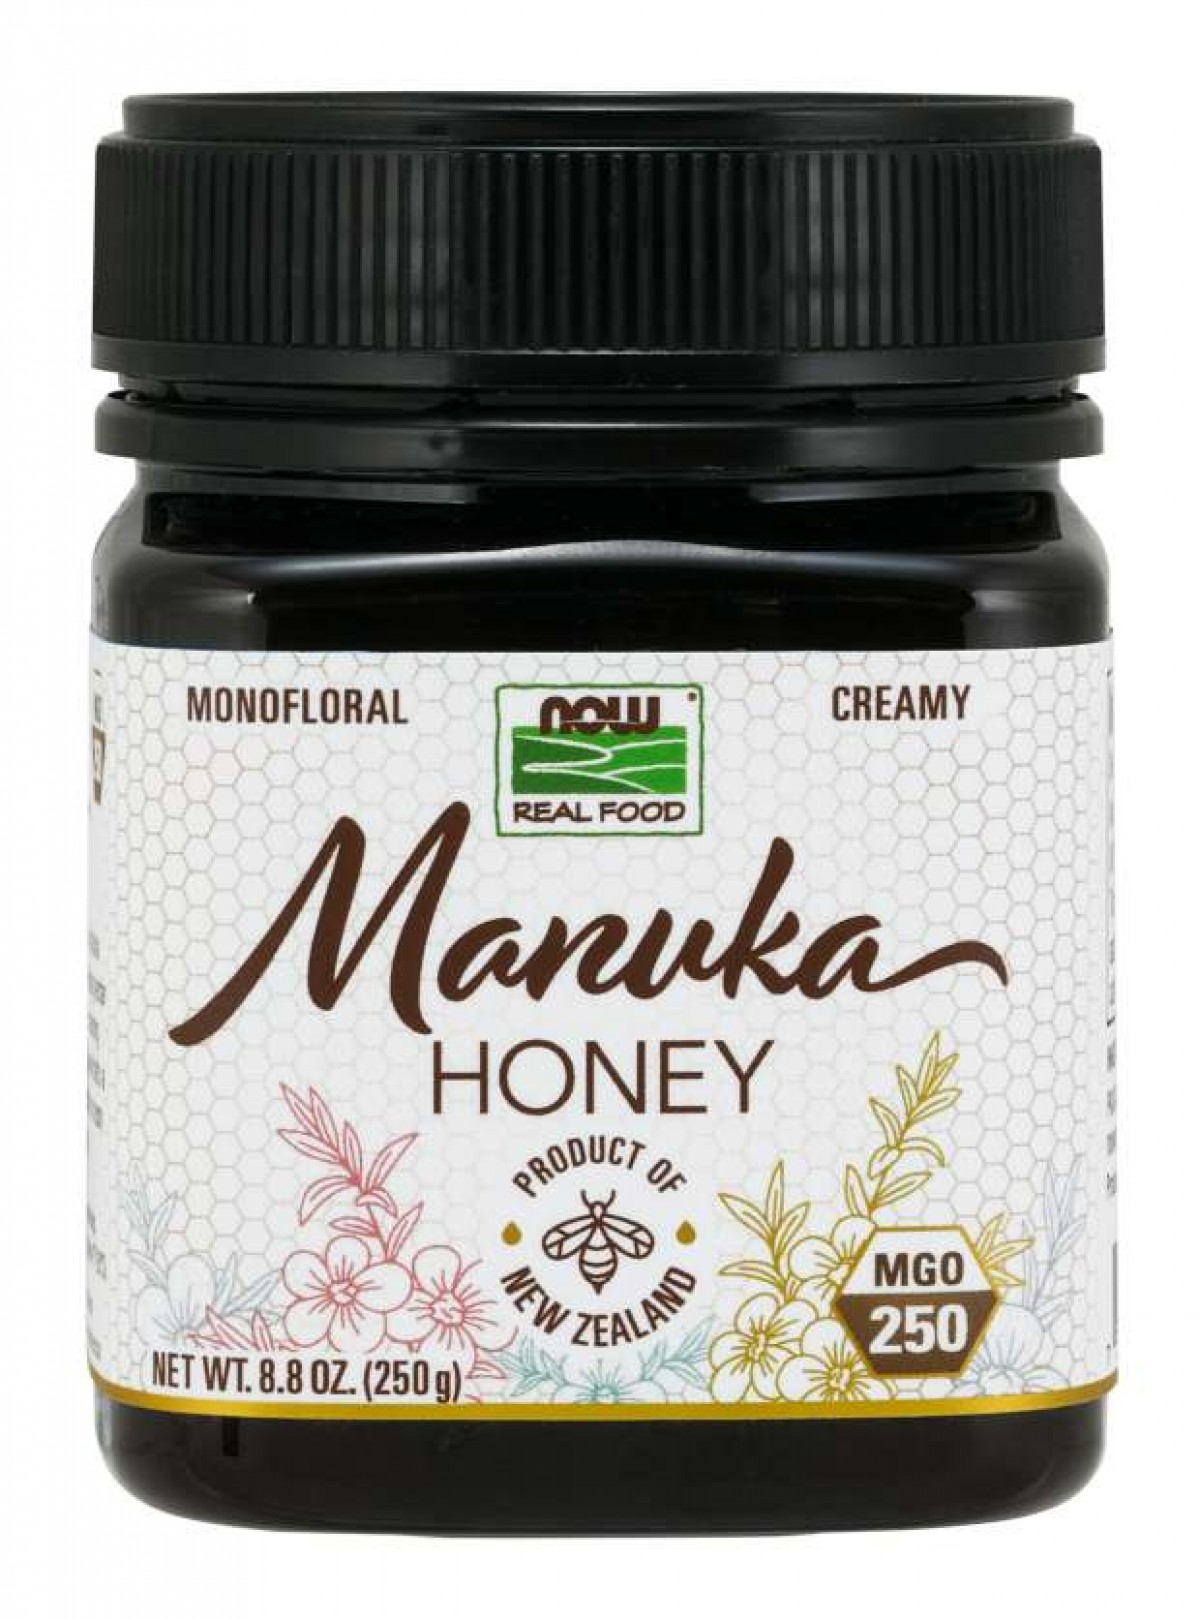 NowFoods Manuka Honey 250g